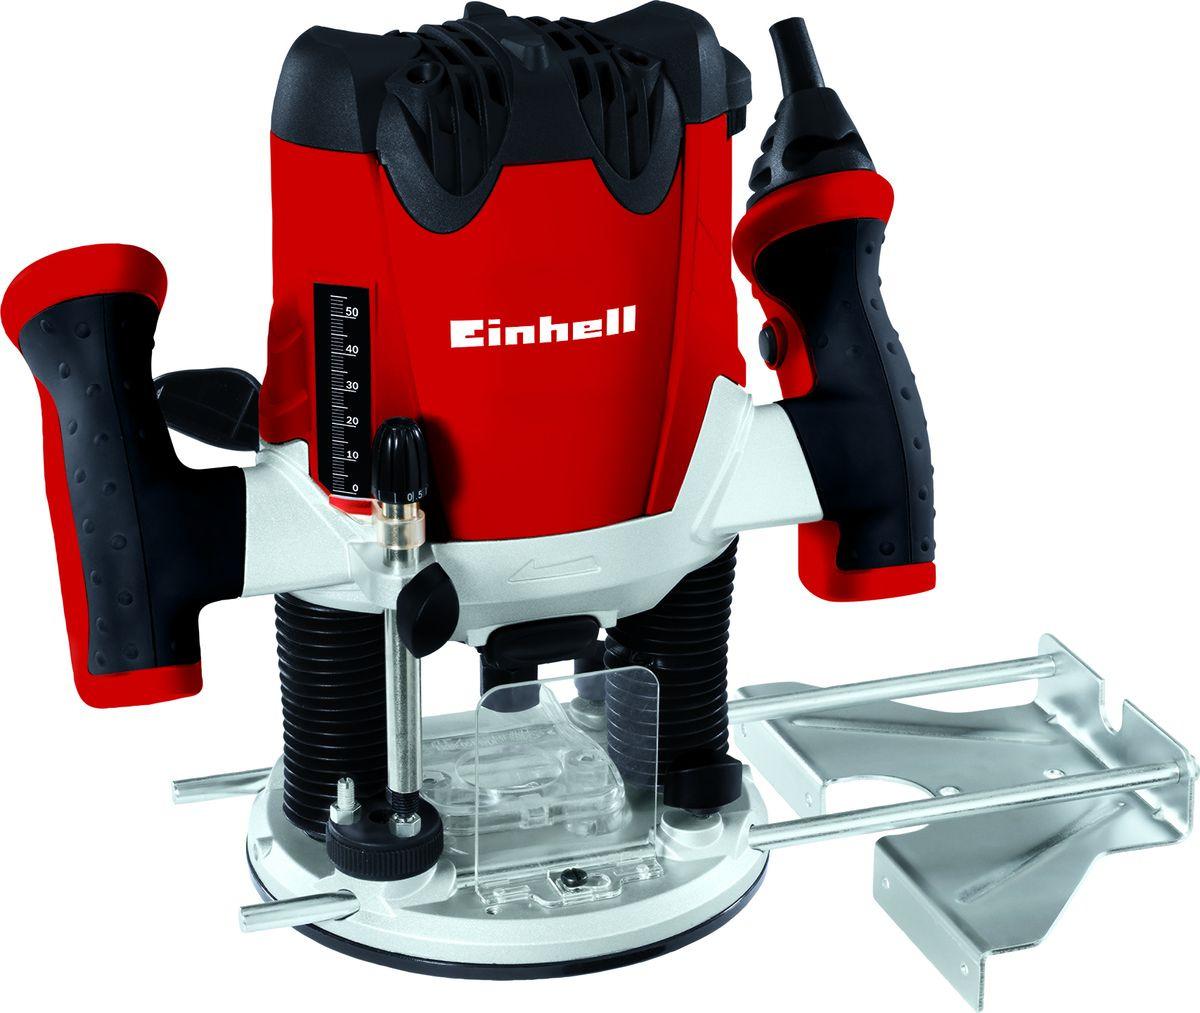 цена на Фрезер Einhell Expert TE-RO 1255 E, 1200Вт, 55 мм, 6,8 мм